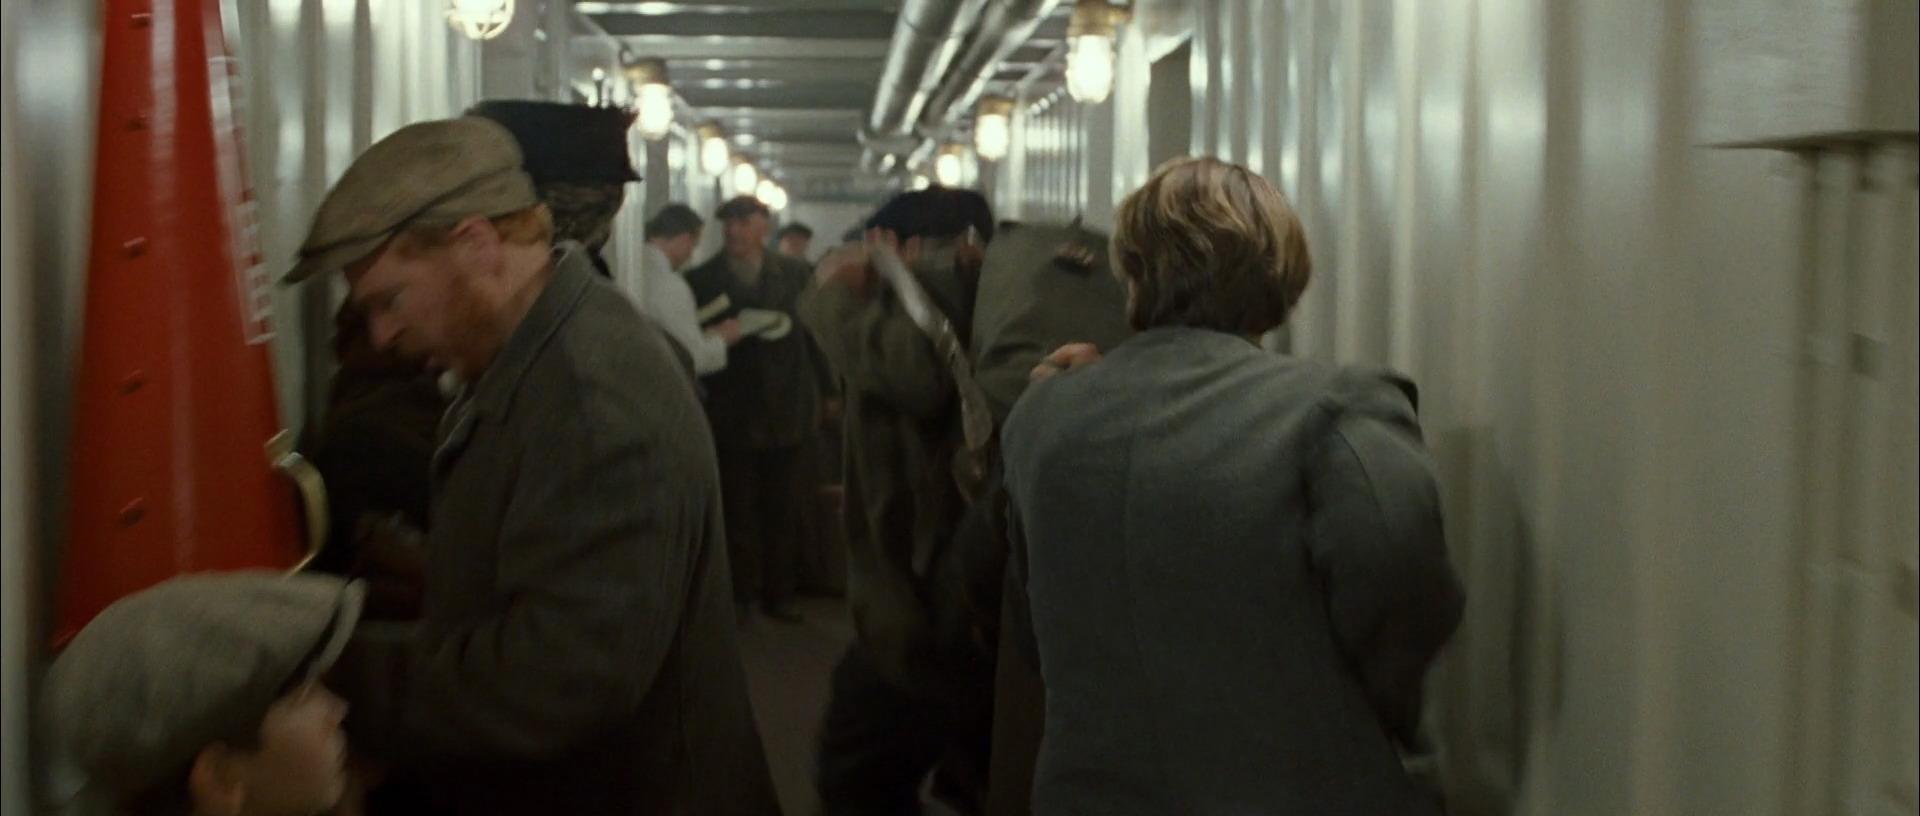 Titanic Drunk (from 1997 Film)